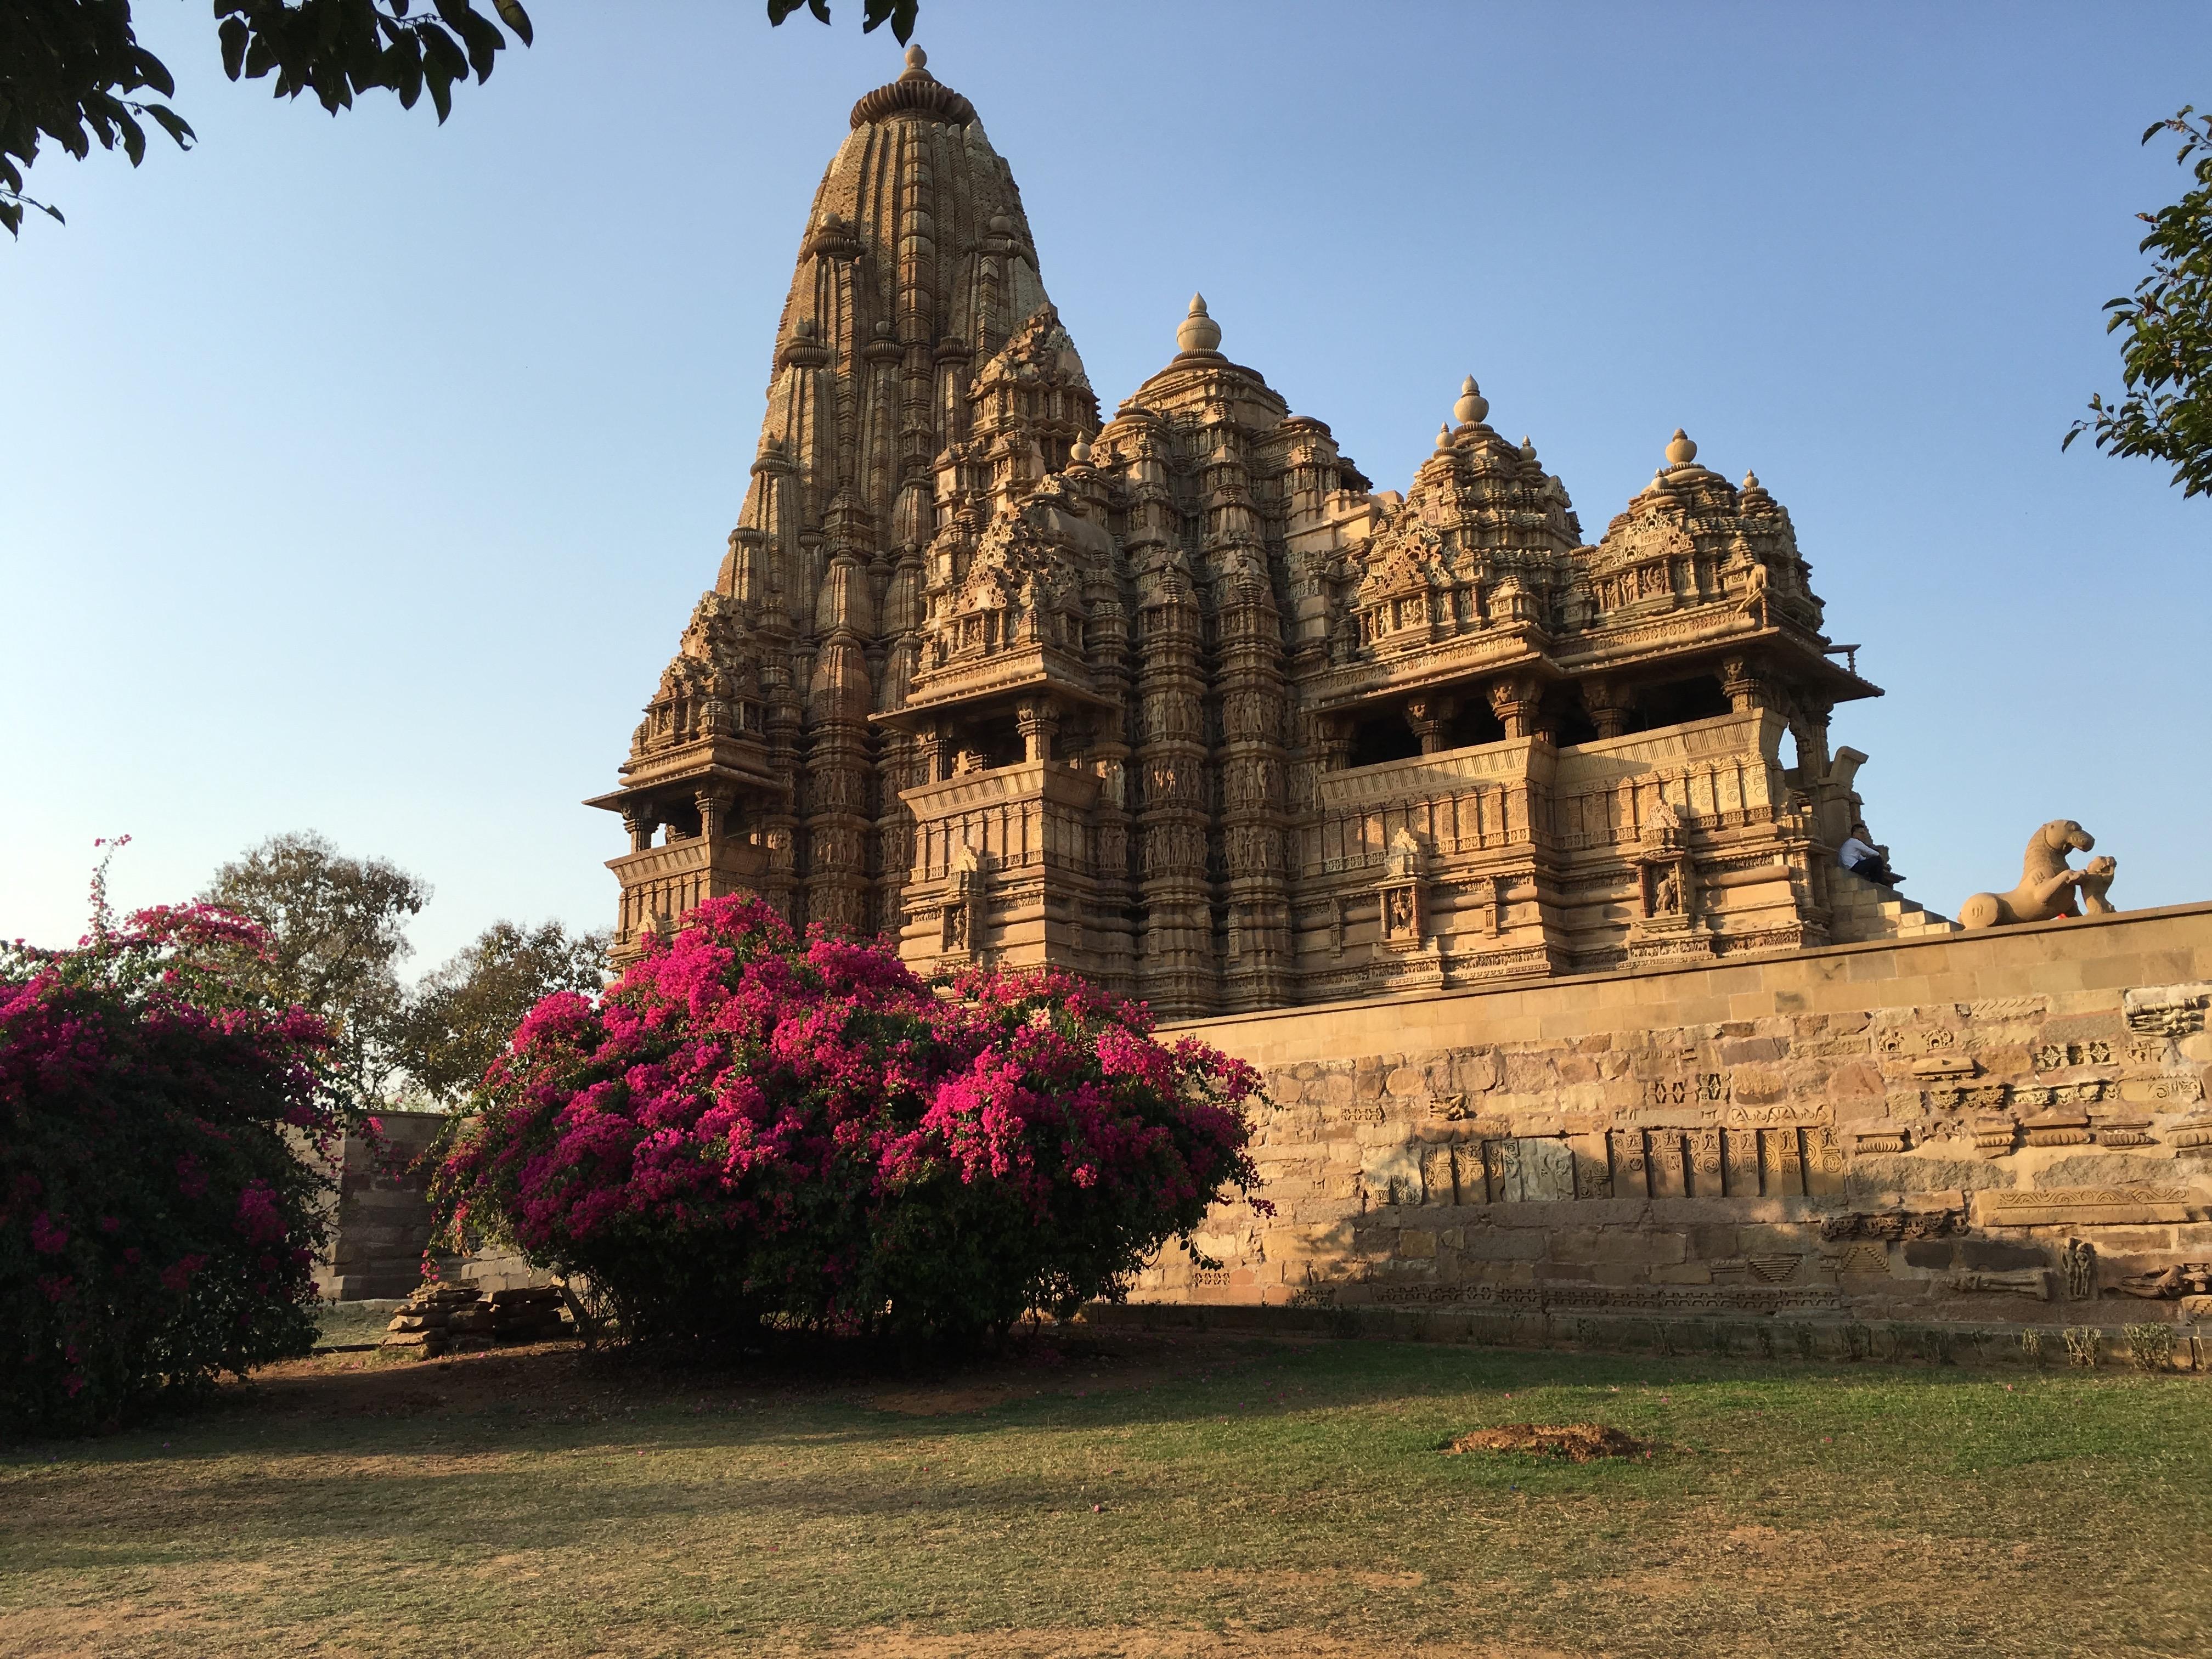 Kama Sutra Temples in Khajuraho